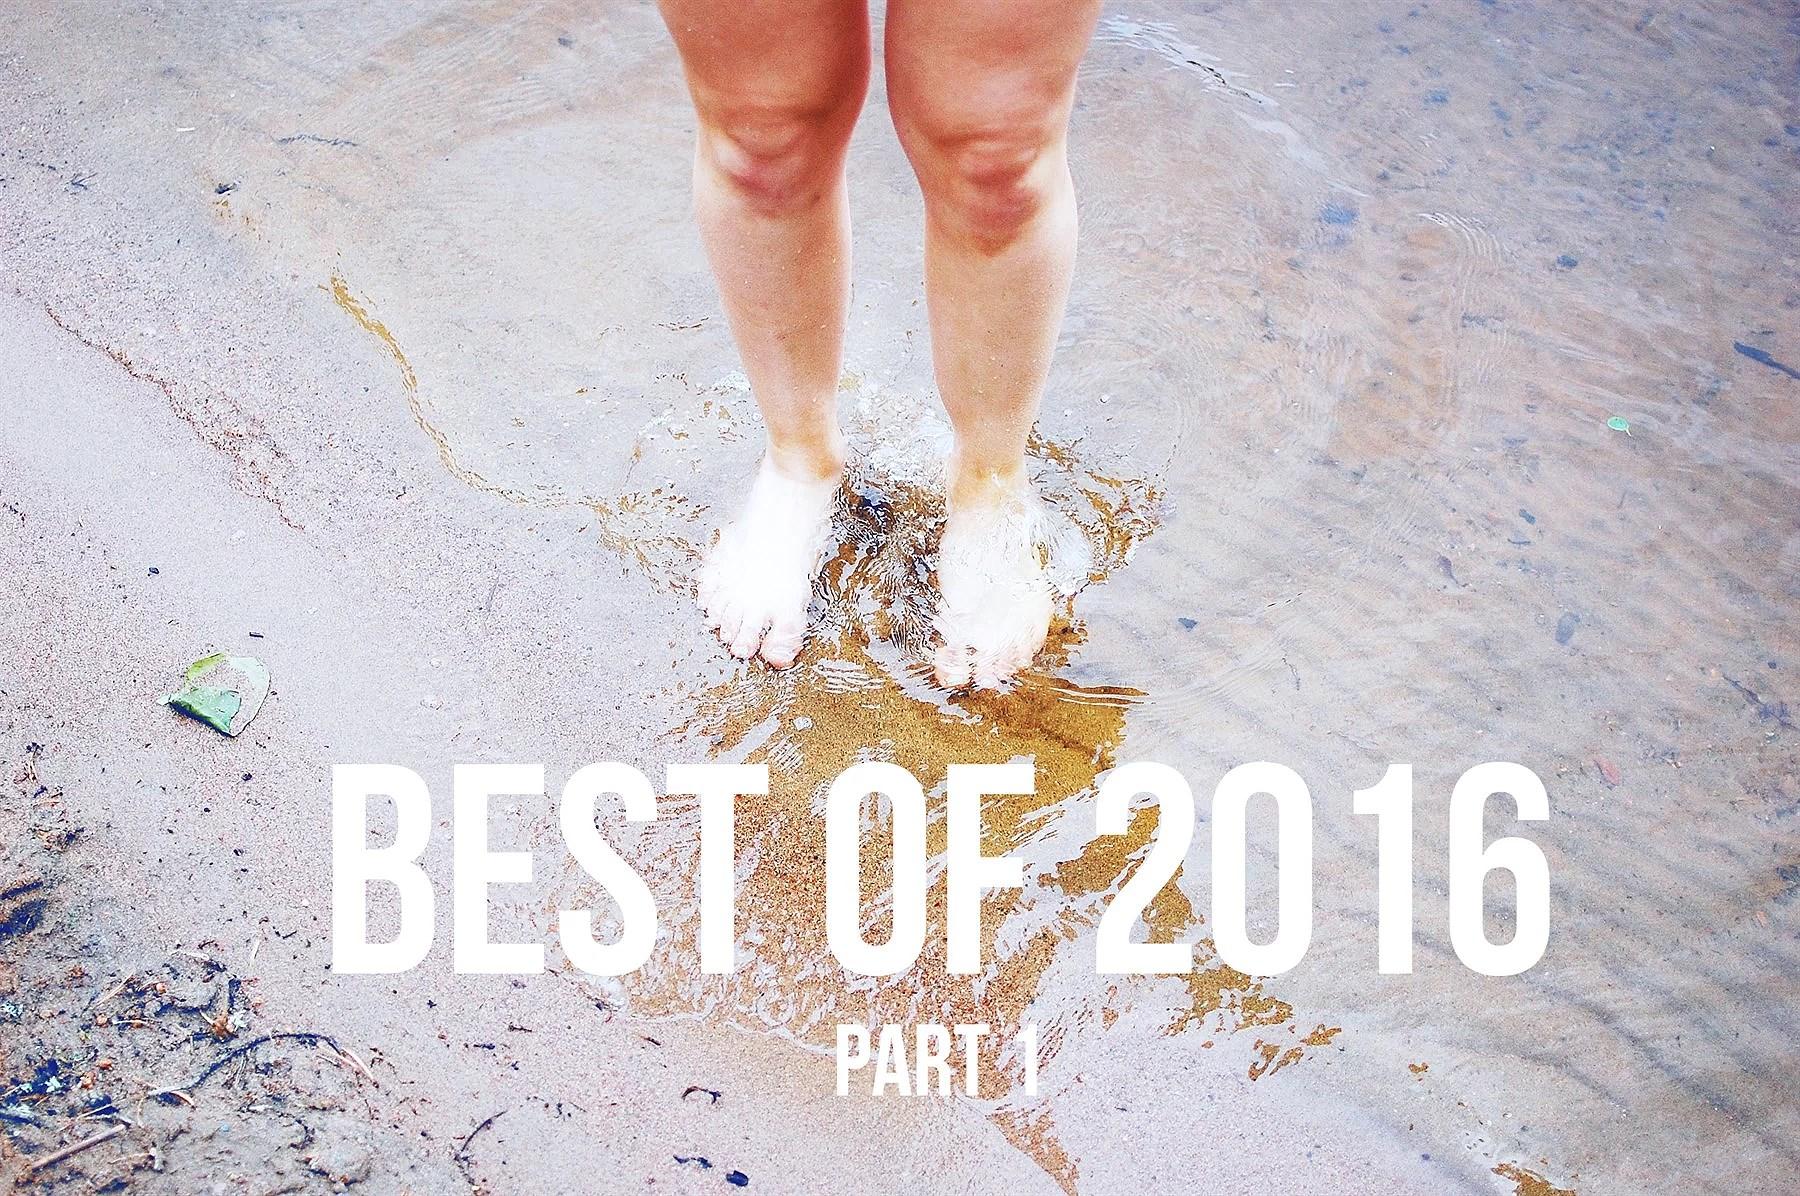 Best of 2016 - part 1